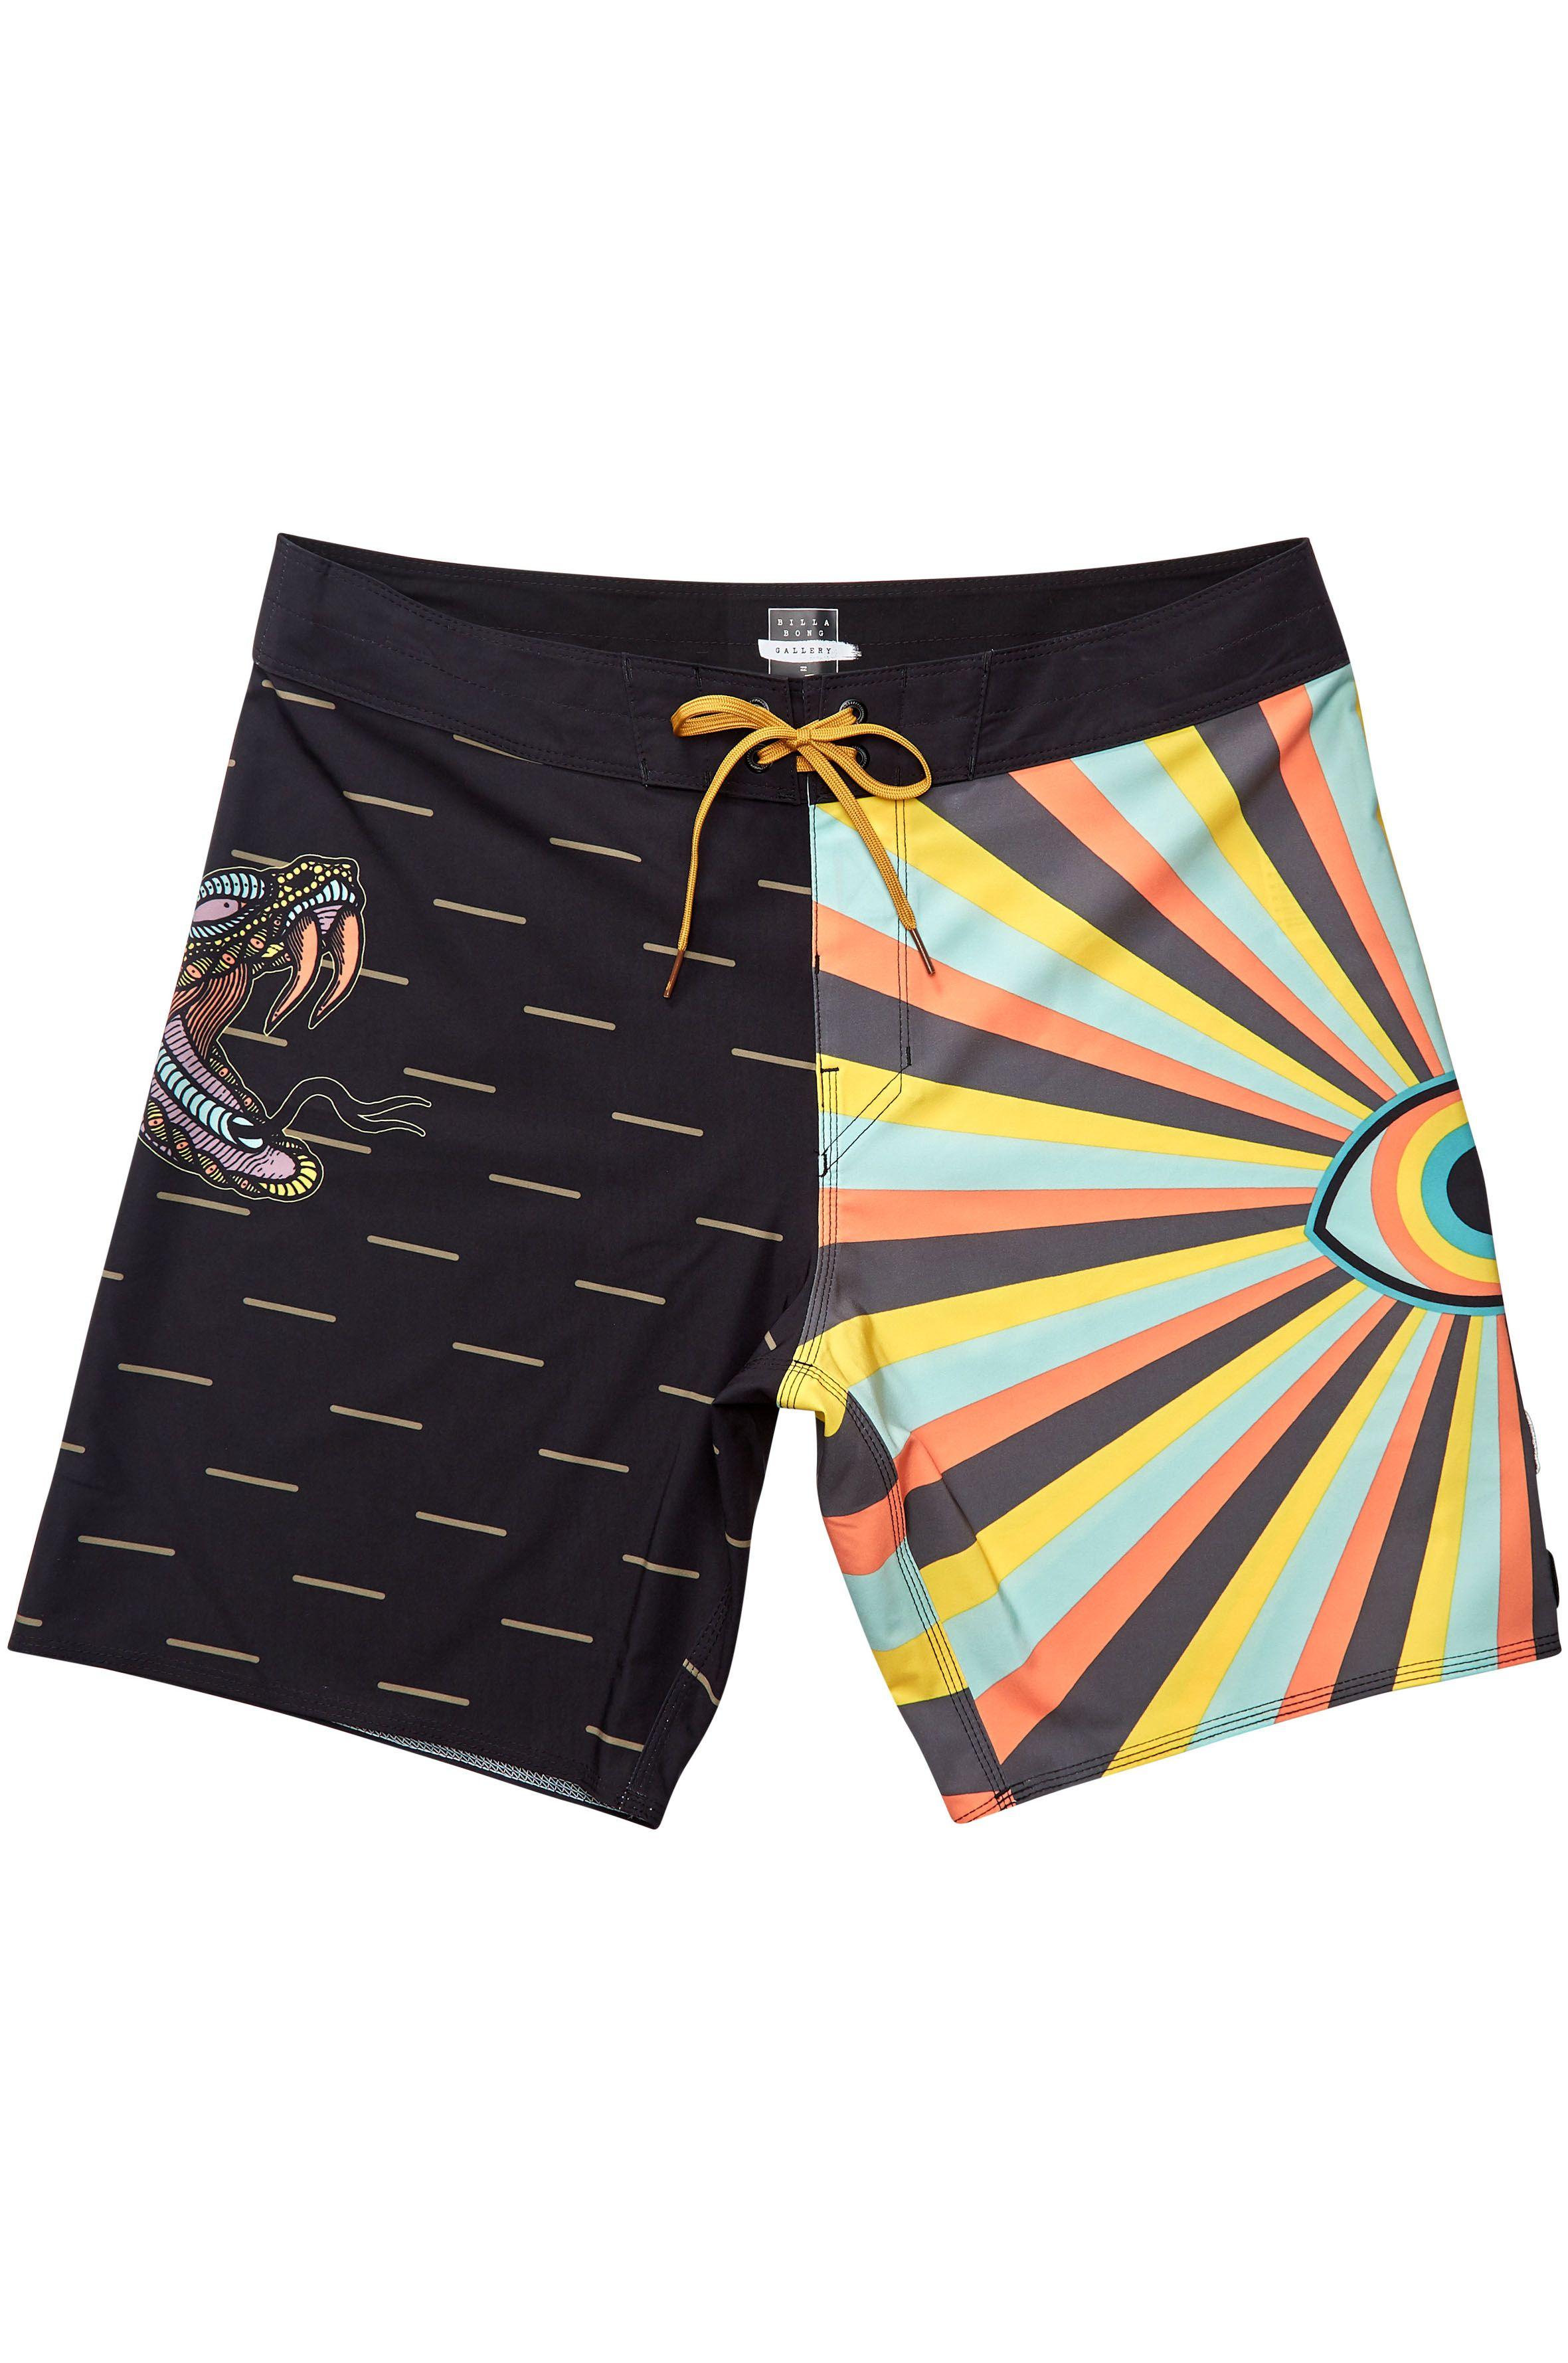 Boardshorts Billabong VIPER PRO GALLERY Black